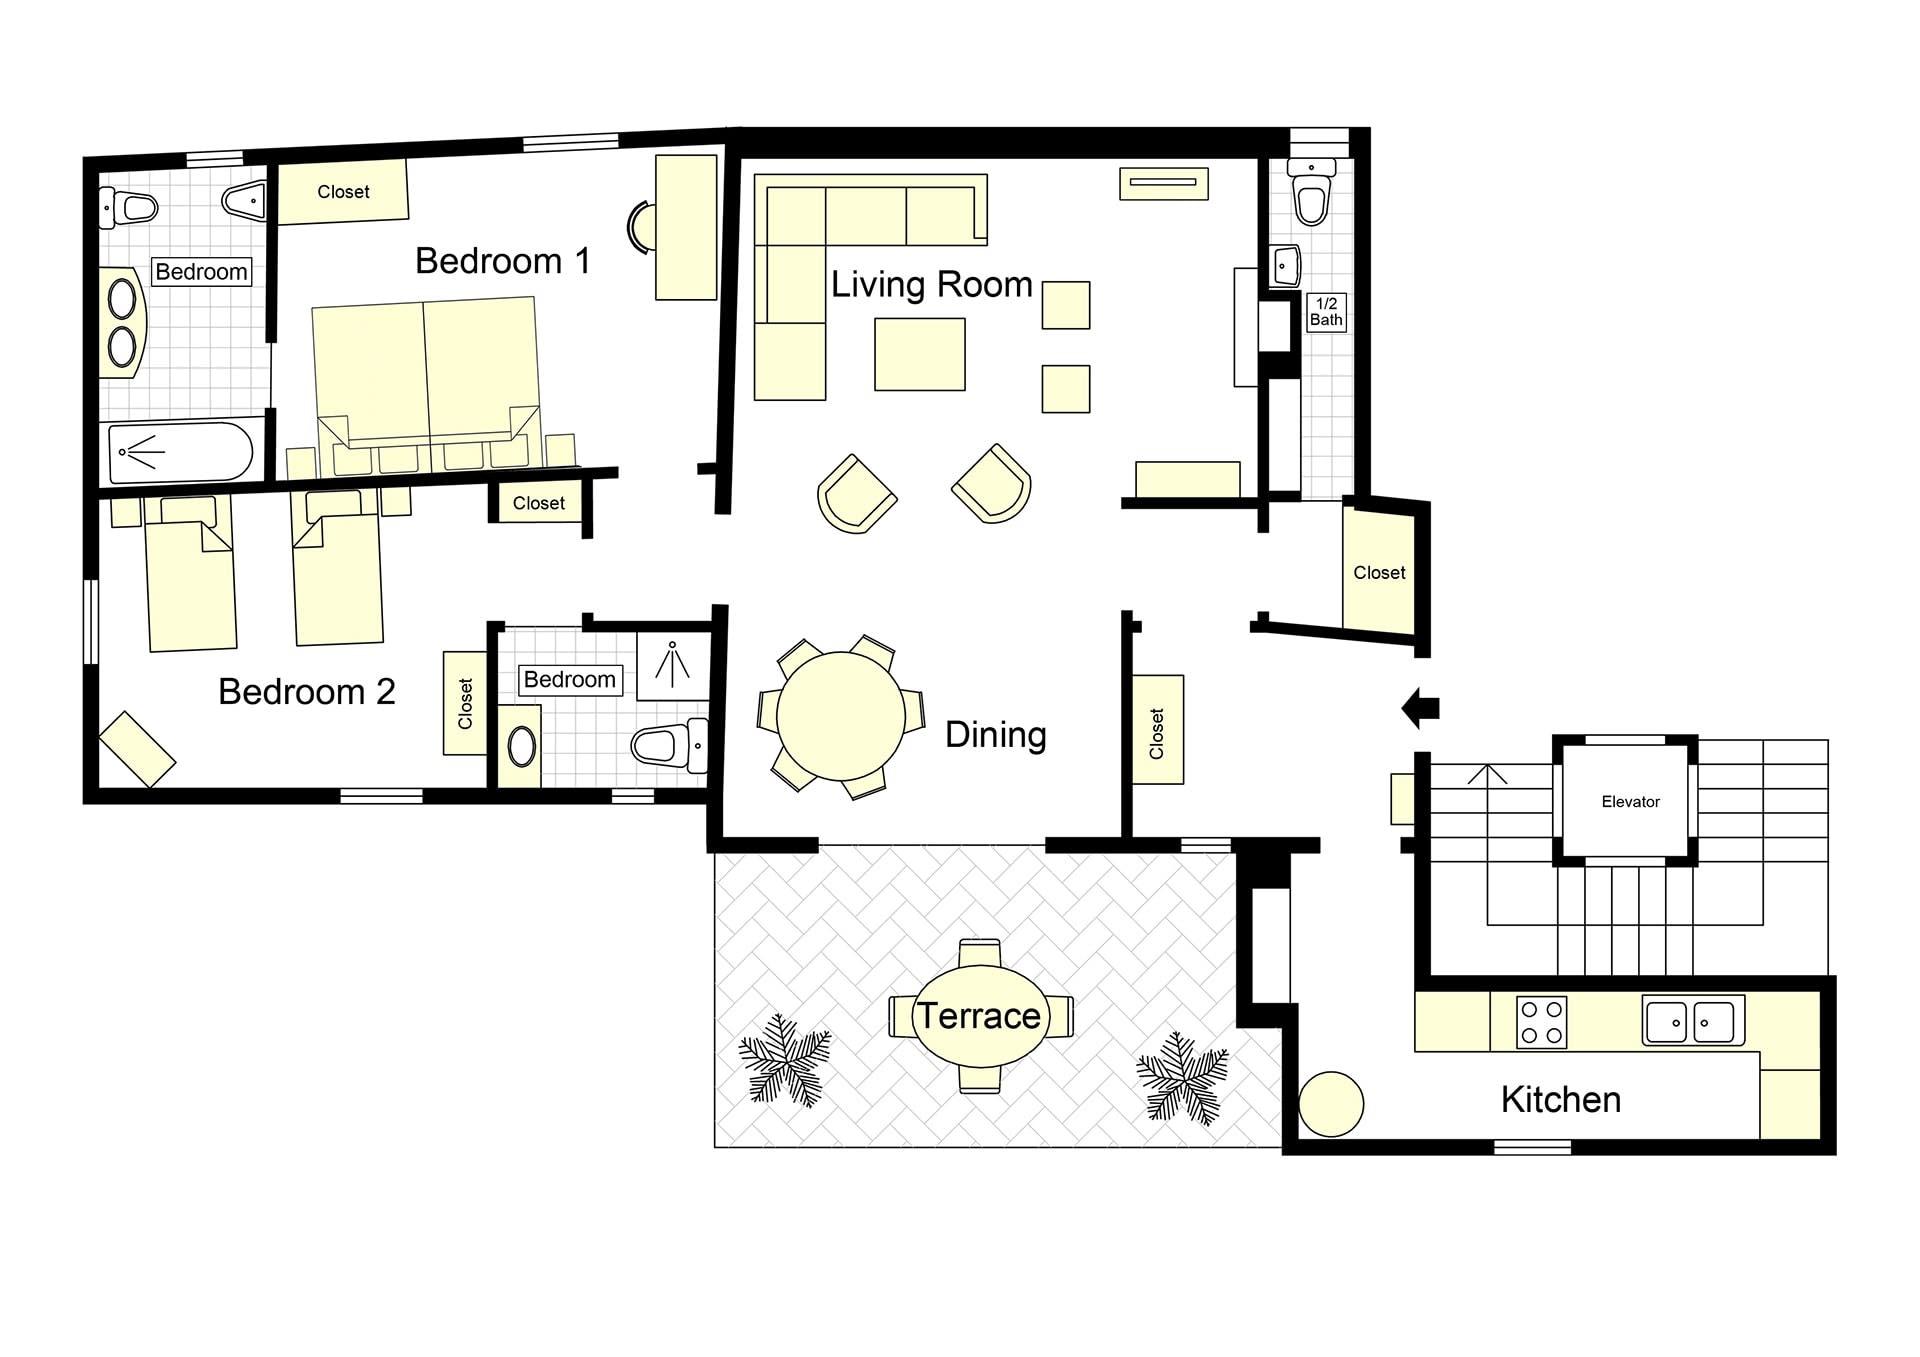 S Croce Miravista Floorplan